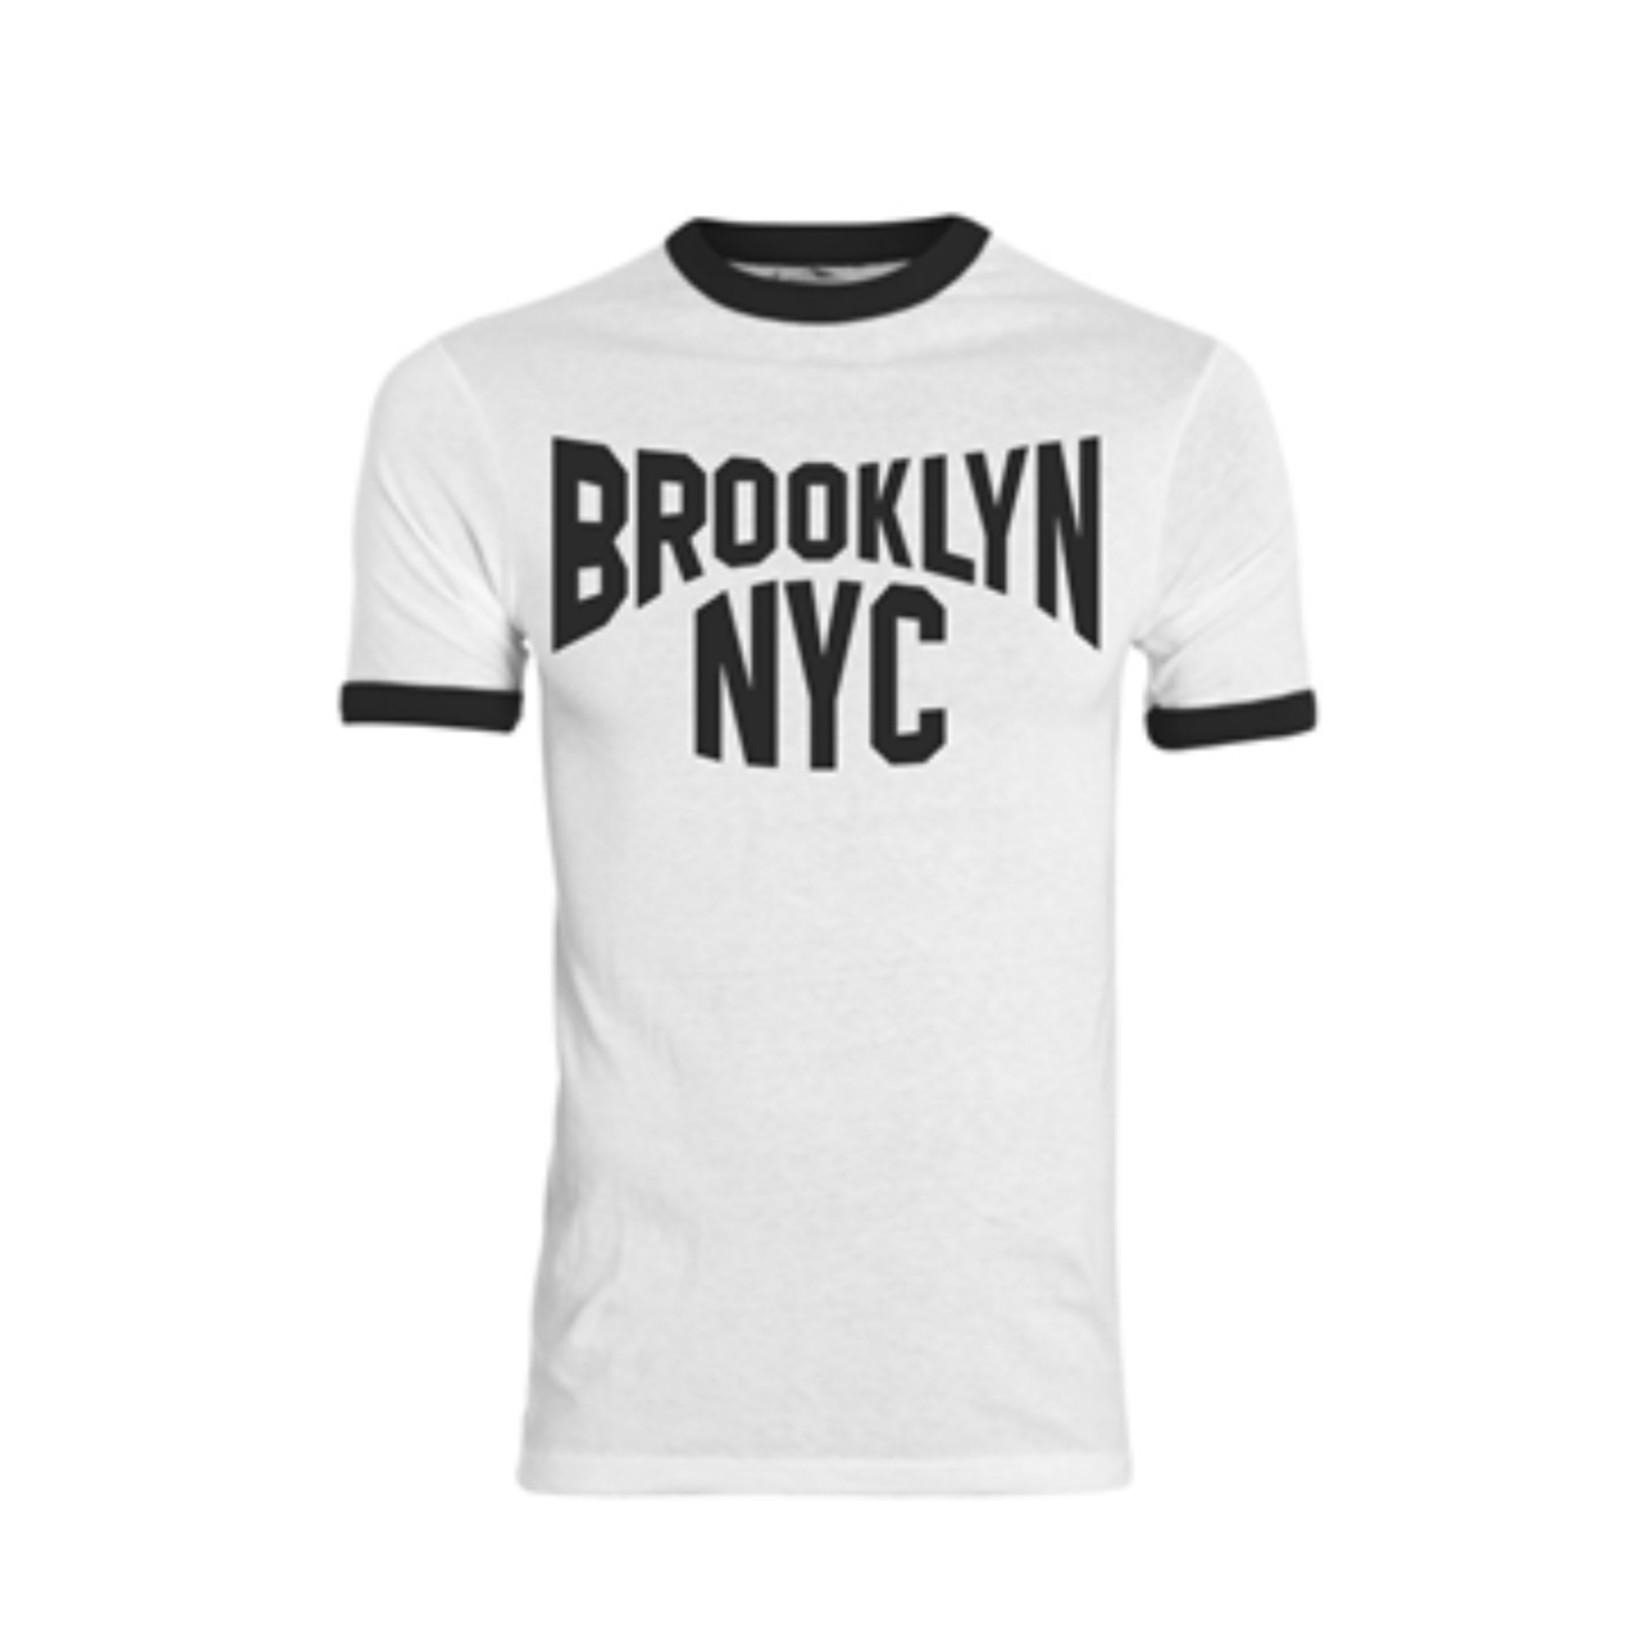 Exit9 Gift Emporium Brooklyn T-Shirt in White/Black